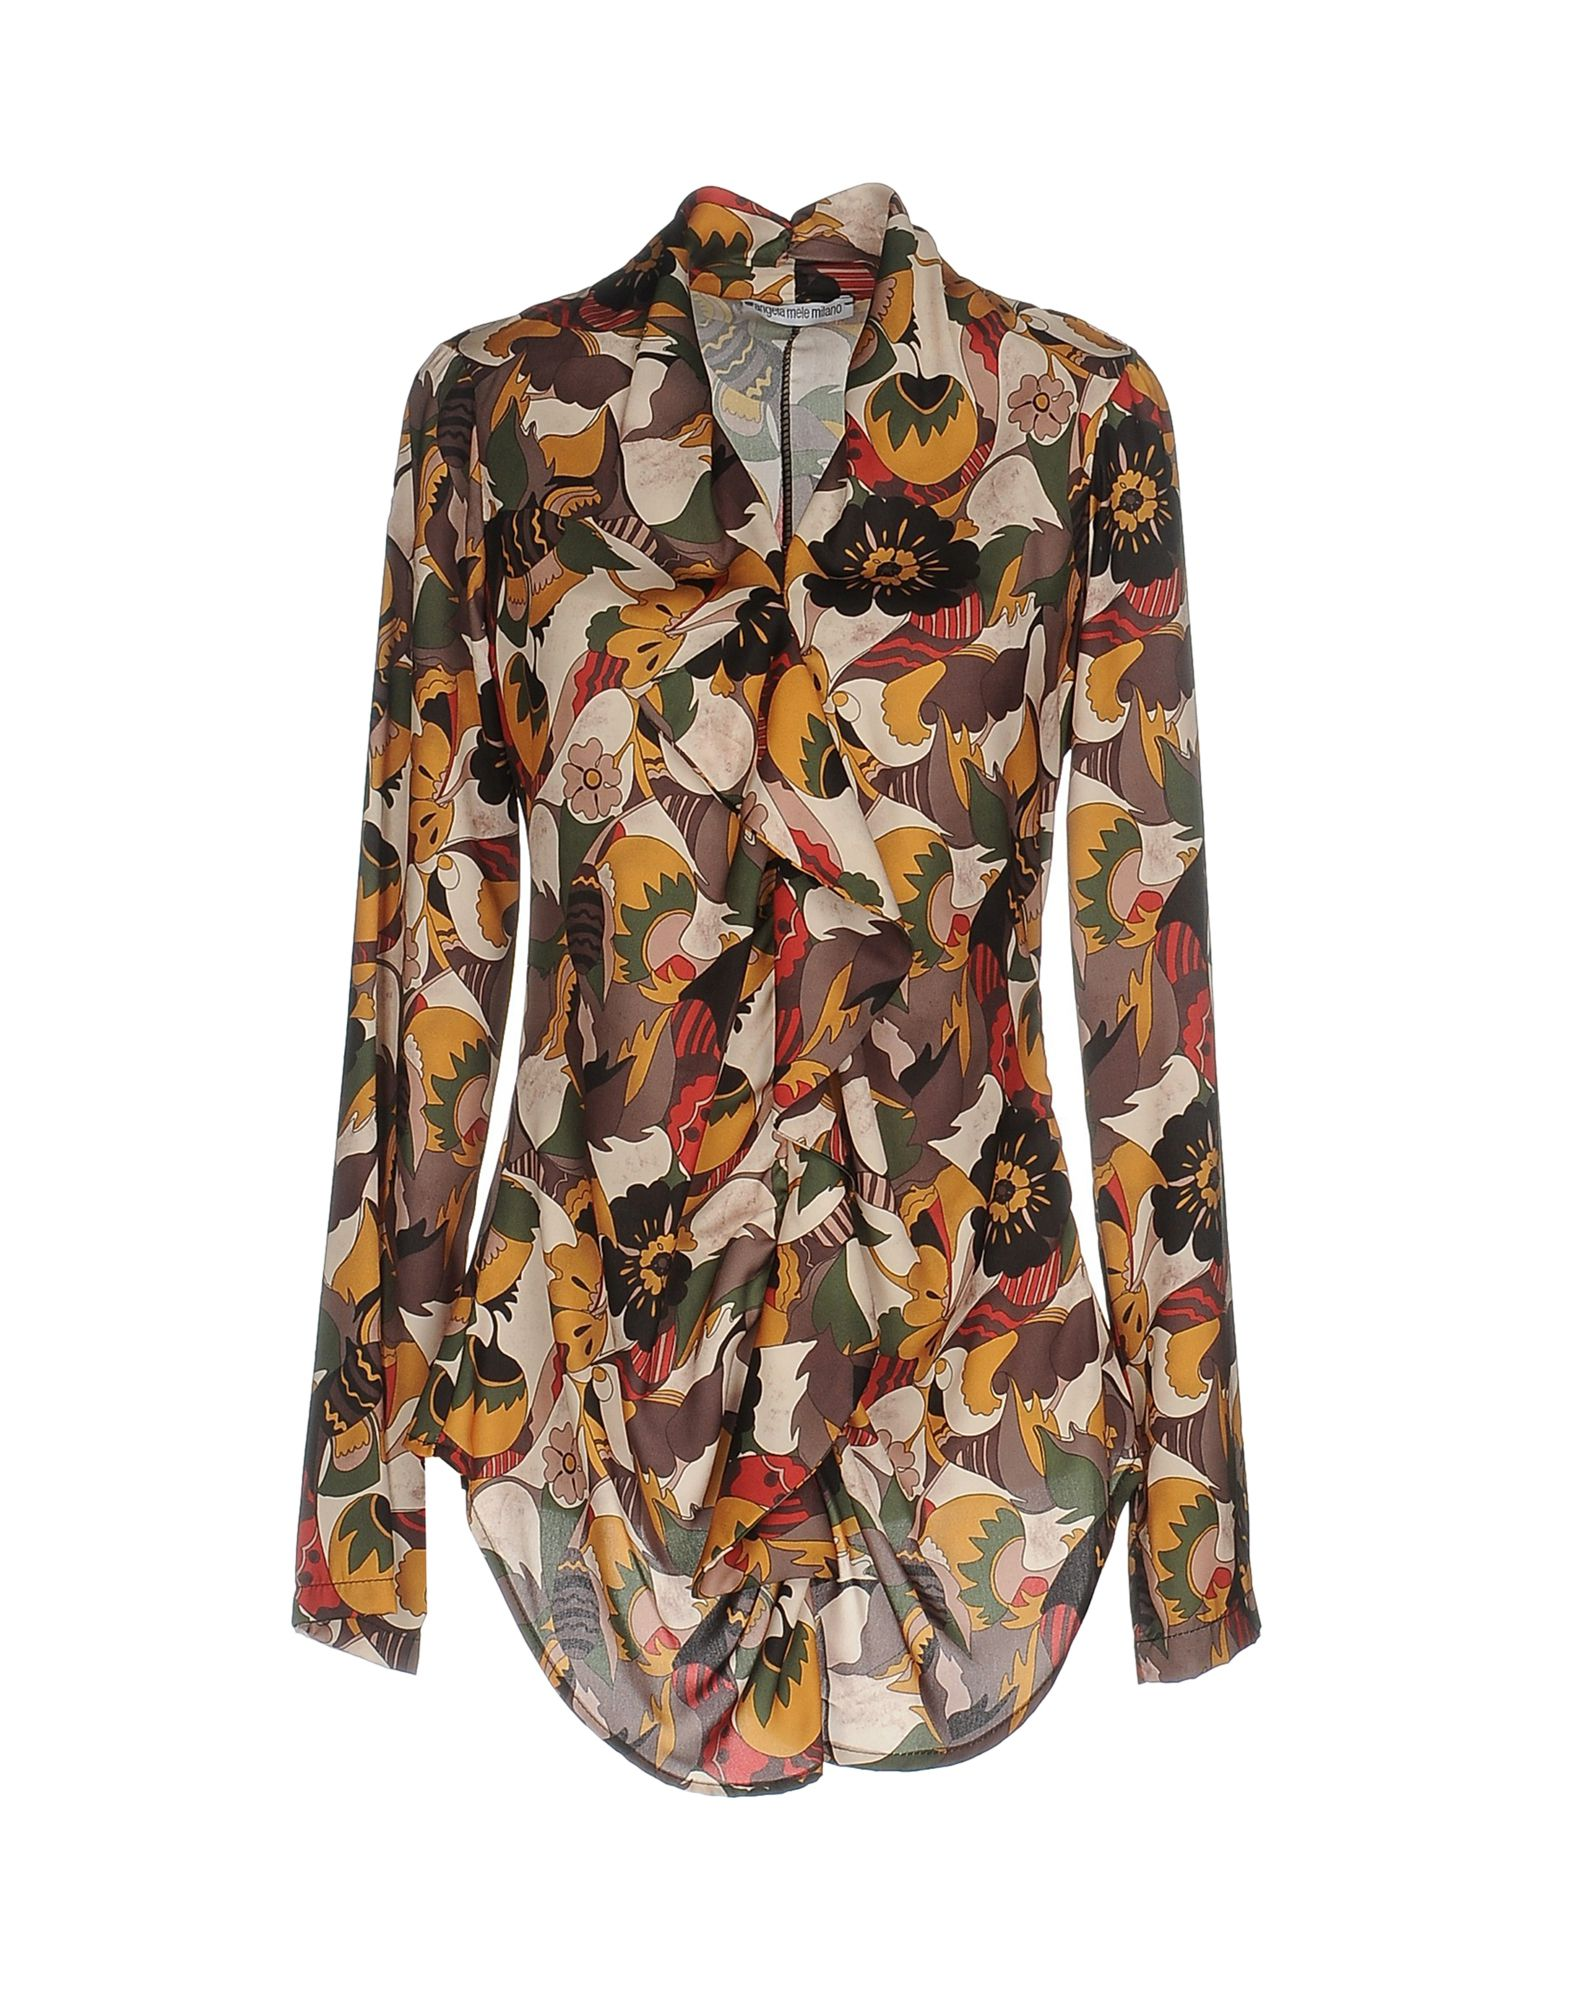 ANGELA MELE MILANO Блузка angela mele milano блузка